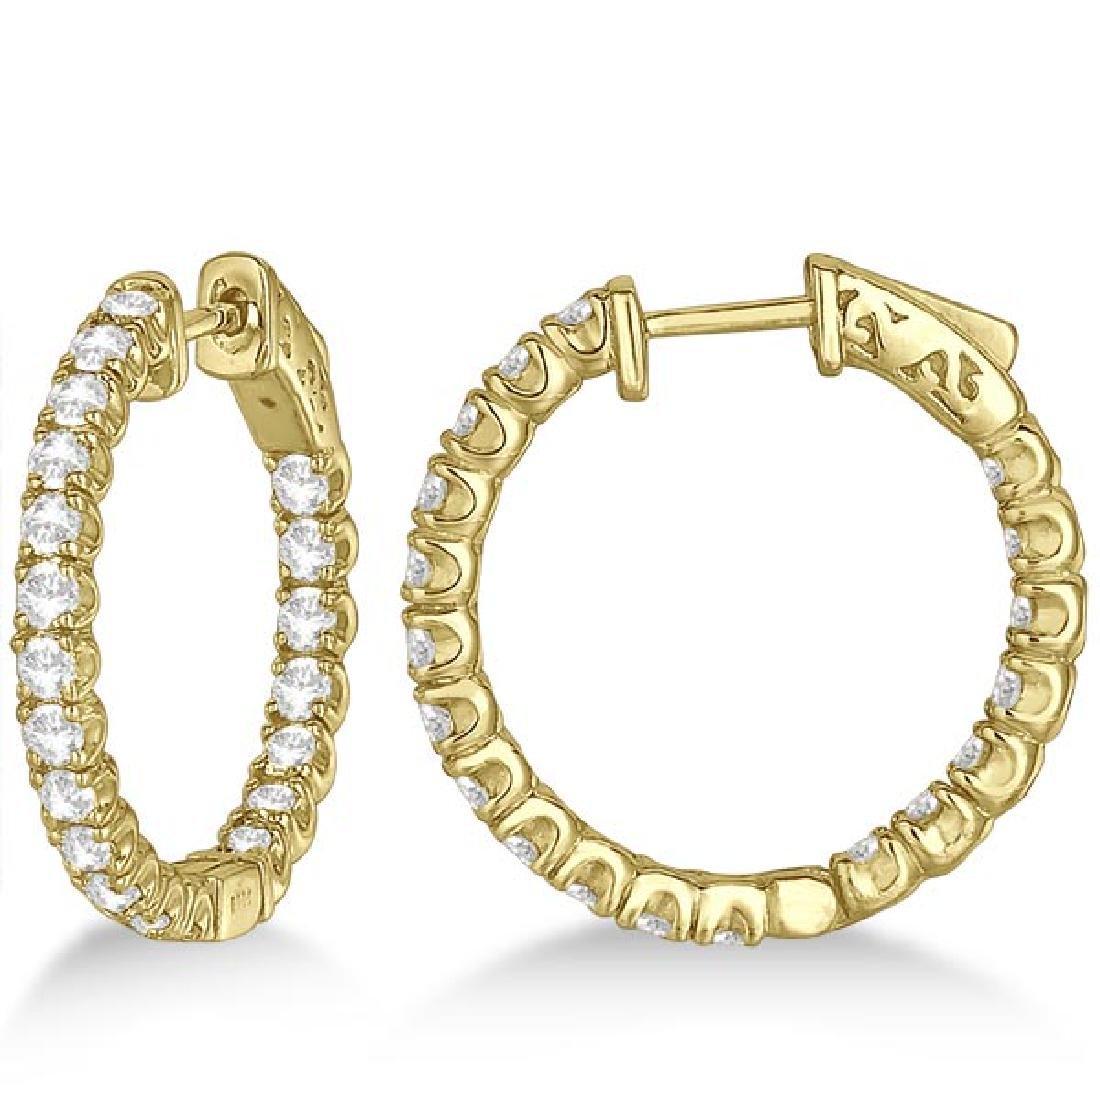 Medium Round Diamond Hoop Earrings 14k Yellow Gold (2.0